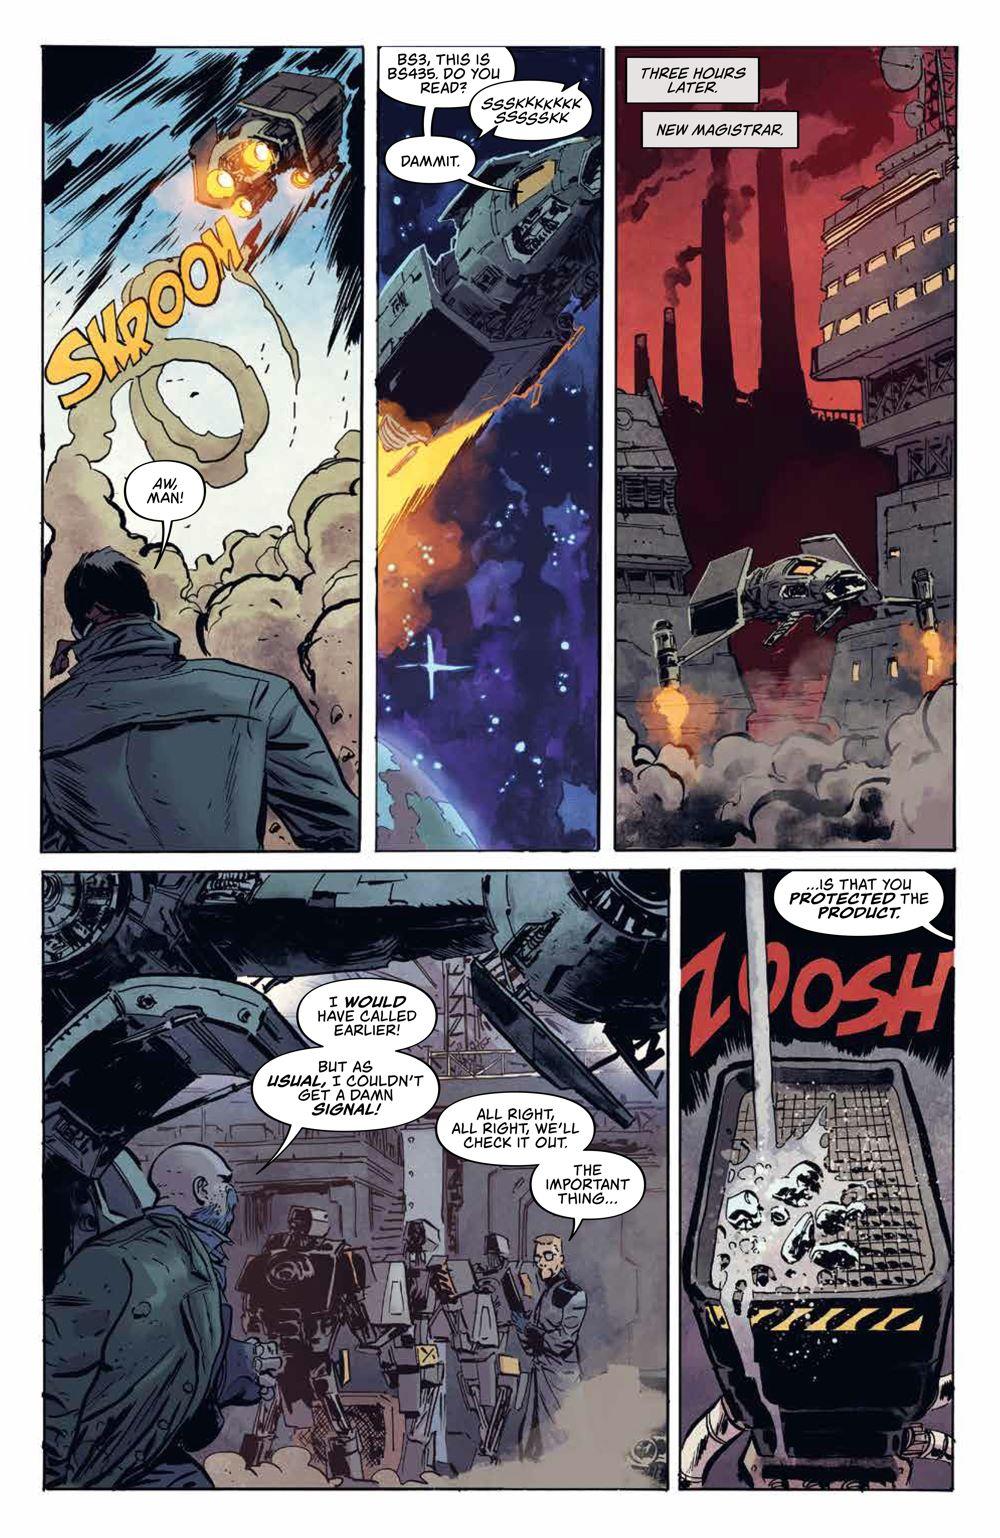 Firefly_BlueSunRising_v1_HC_PRESS_13 ComicList Previews: FIREFLY BLUE SUN RISING VOLUME 1 HC